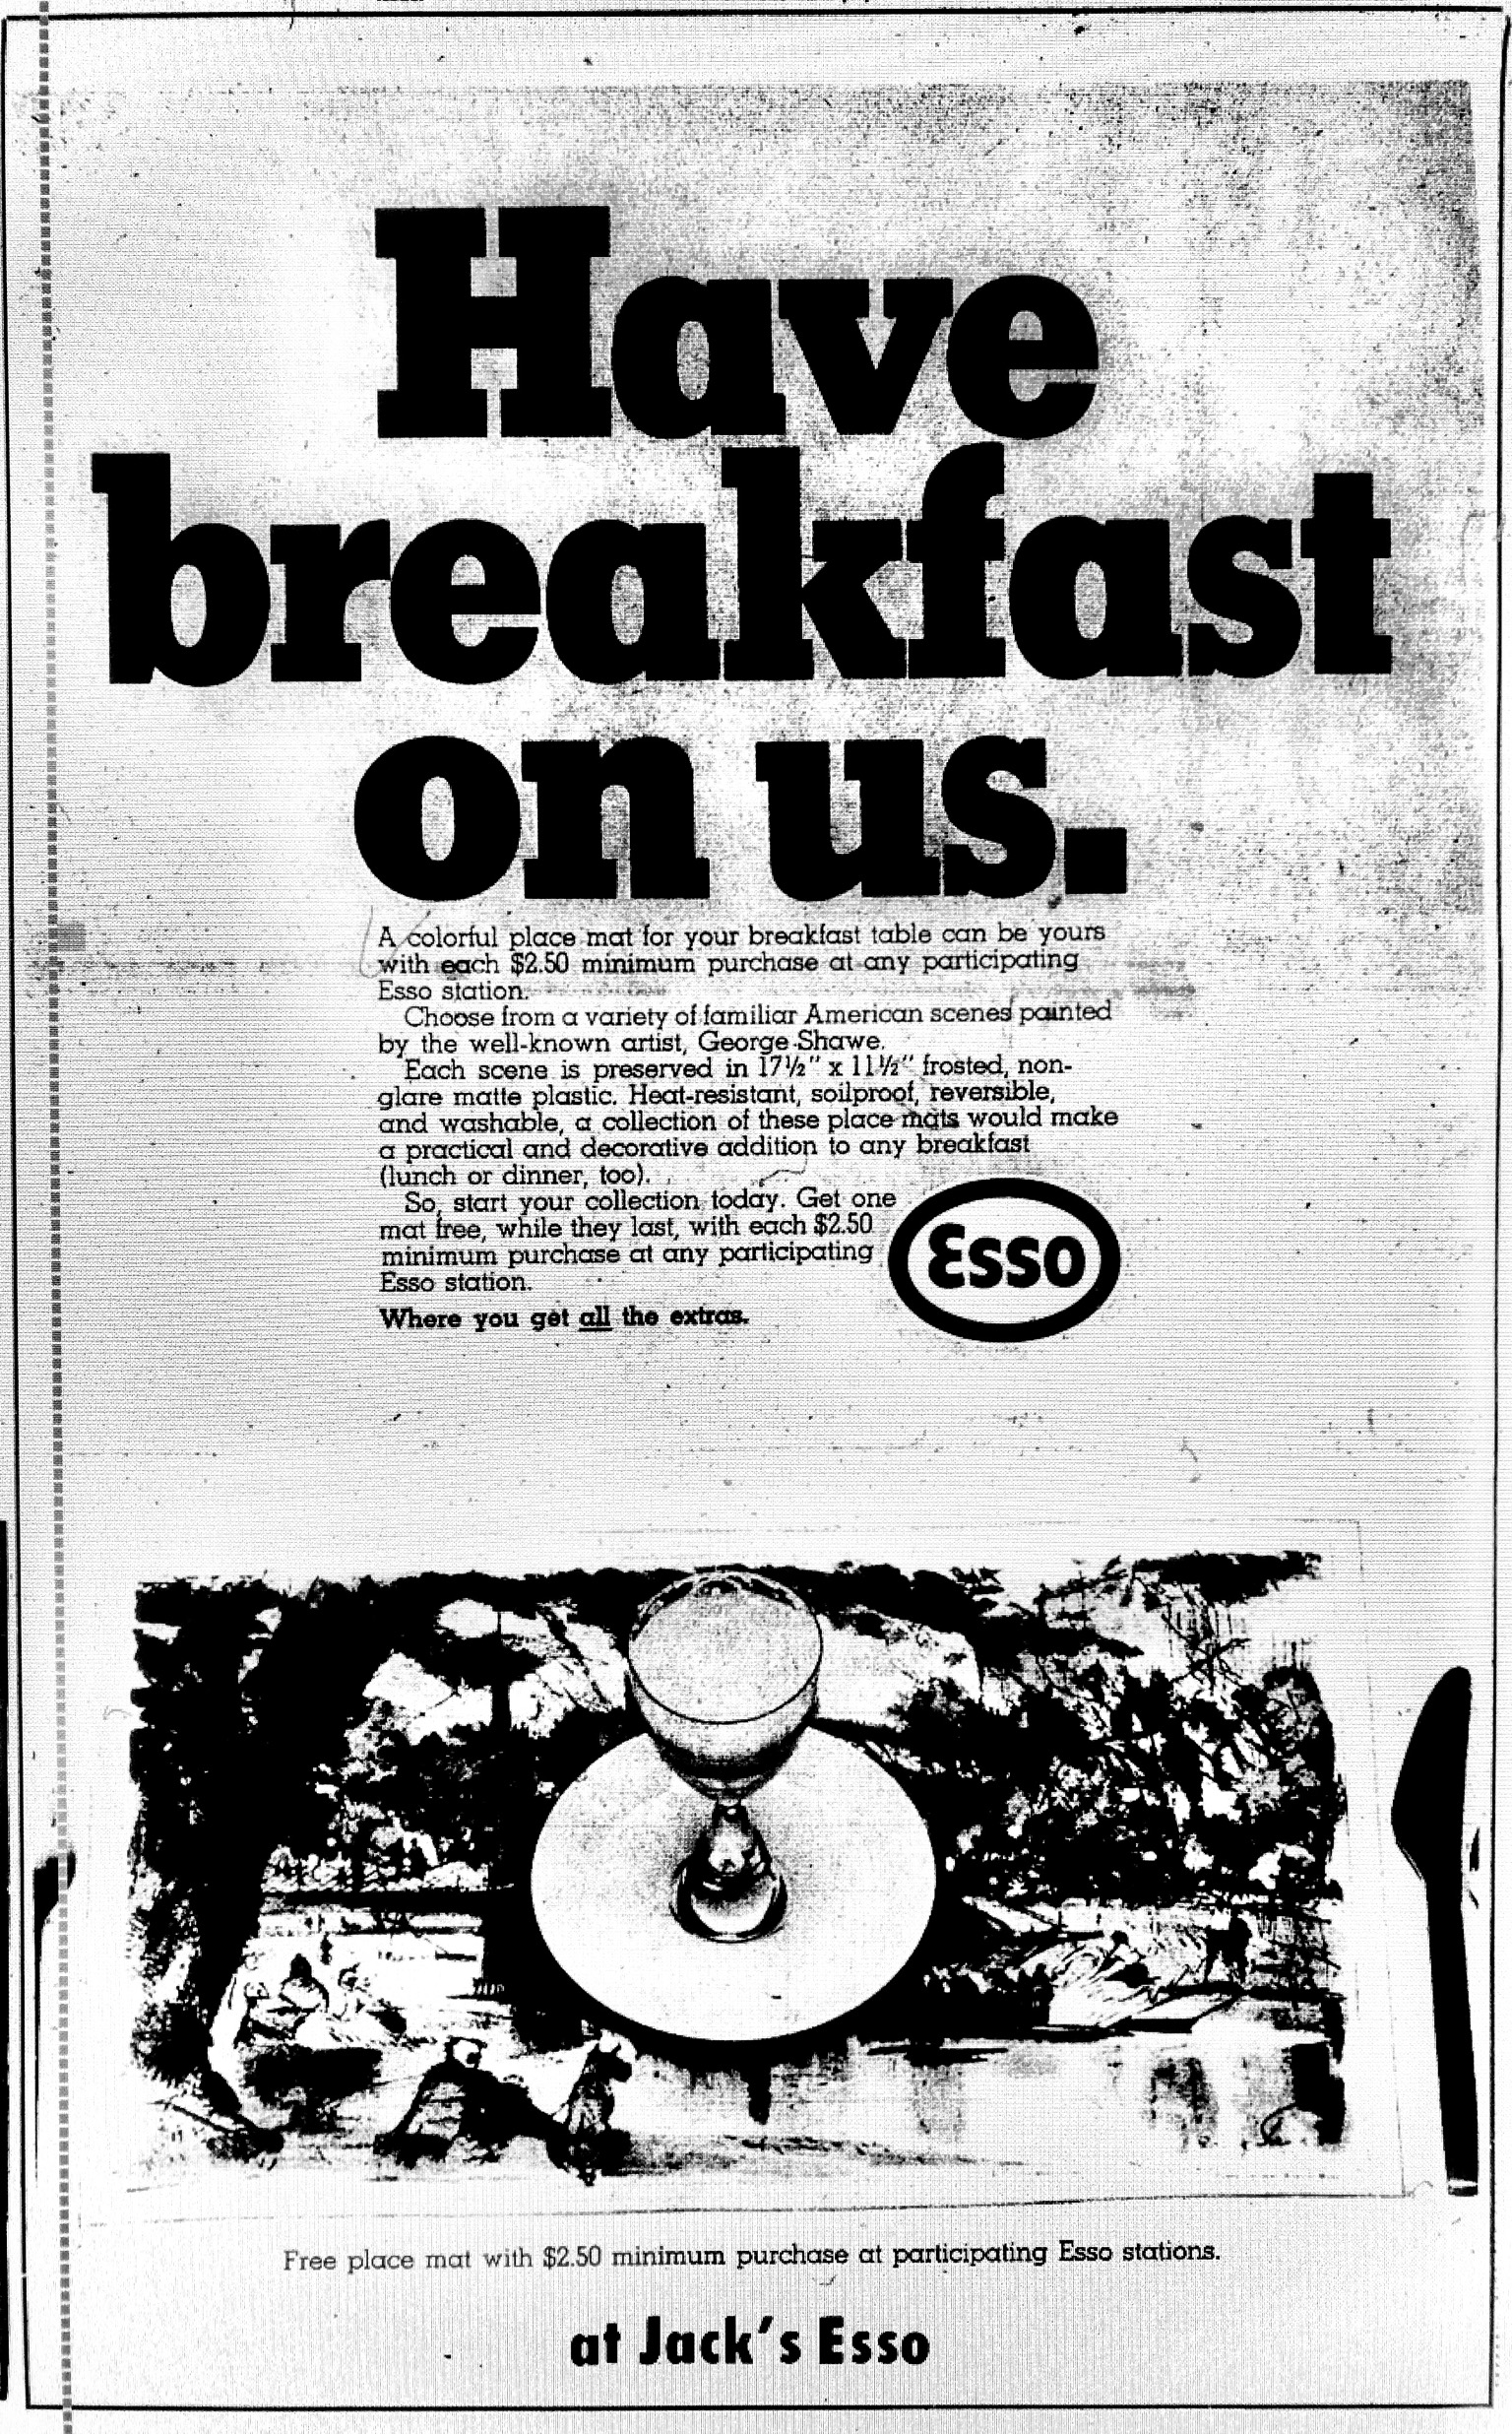 Jack's Esso breakfast